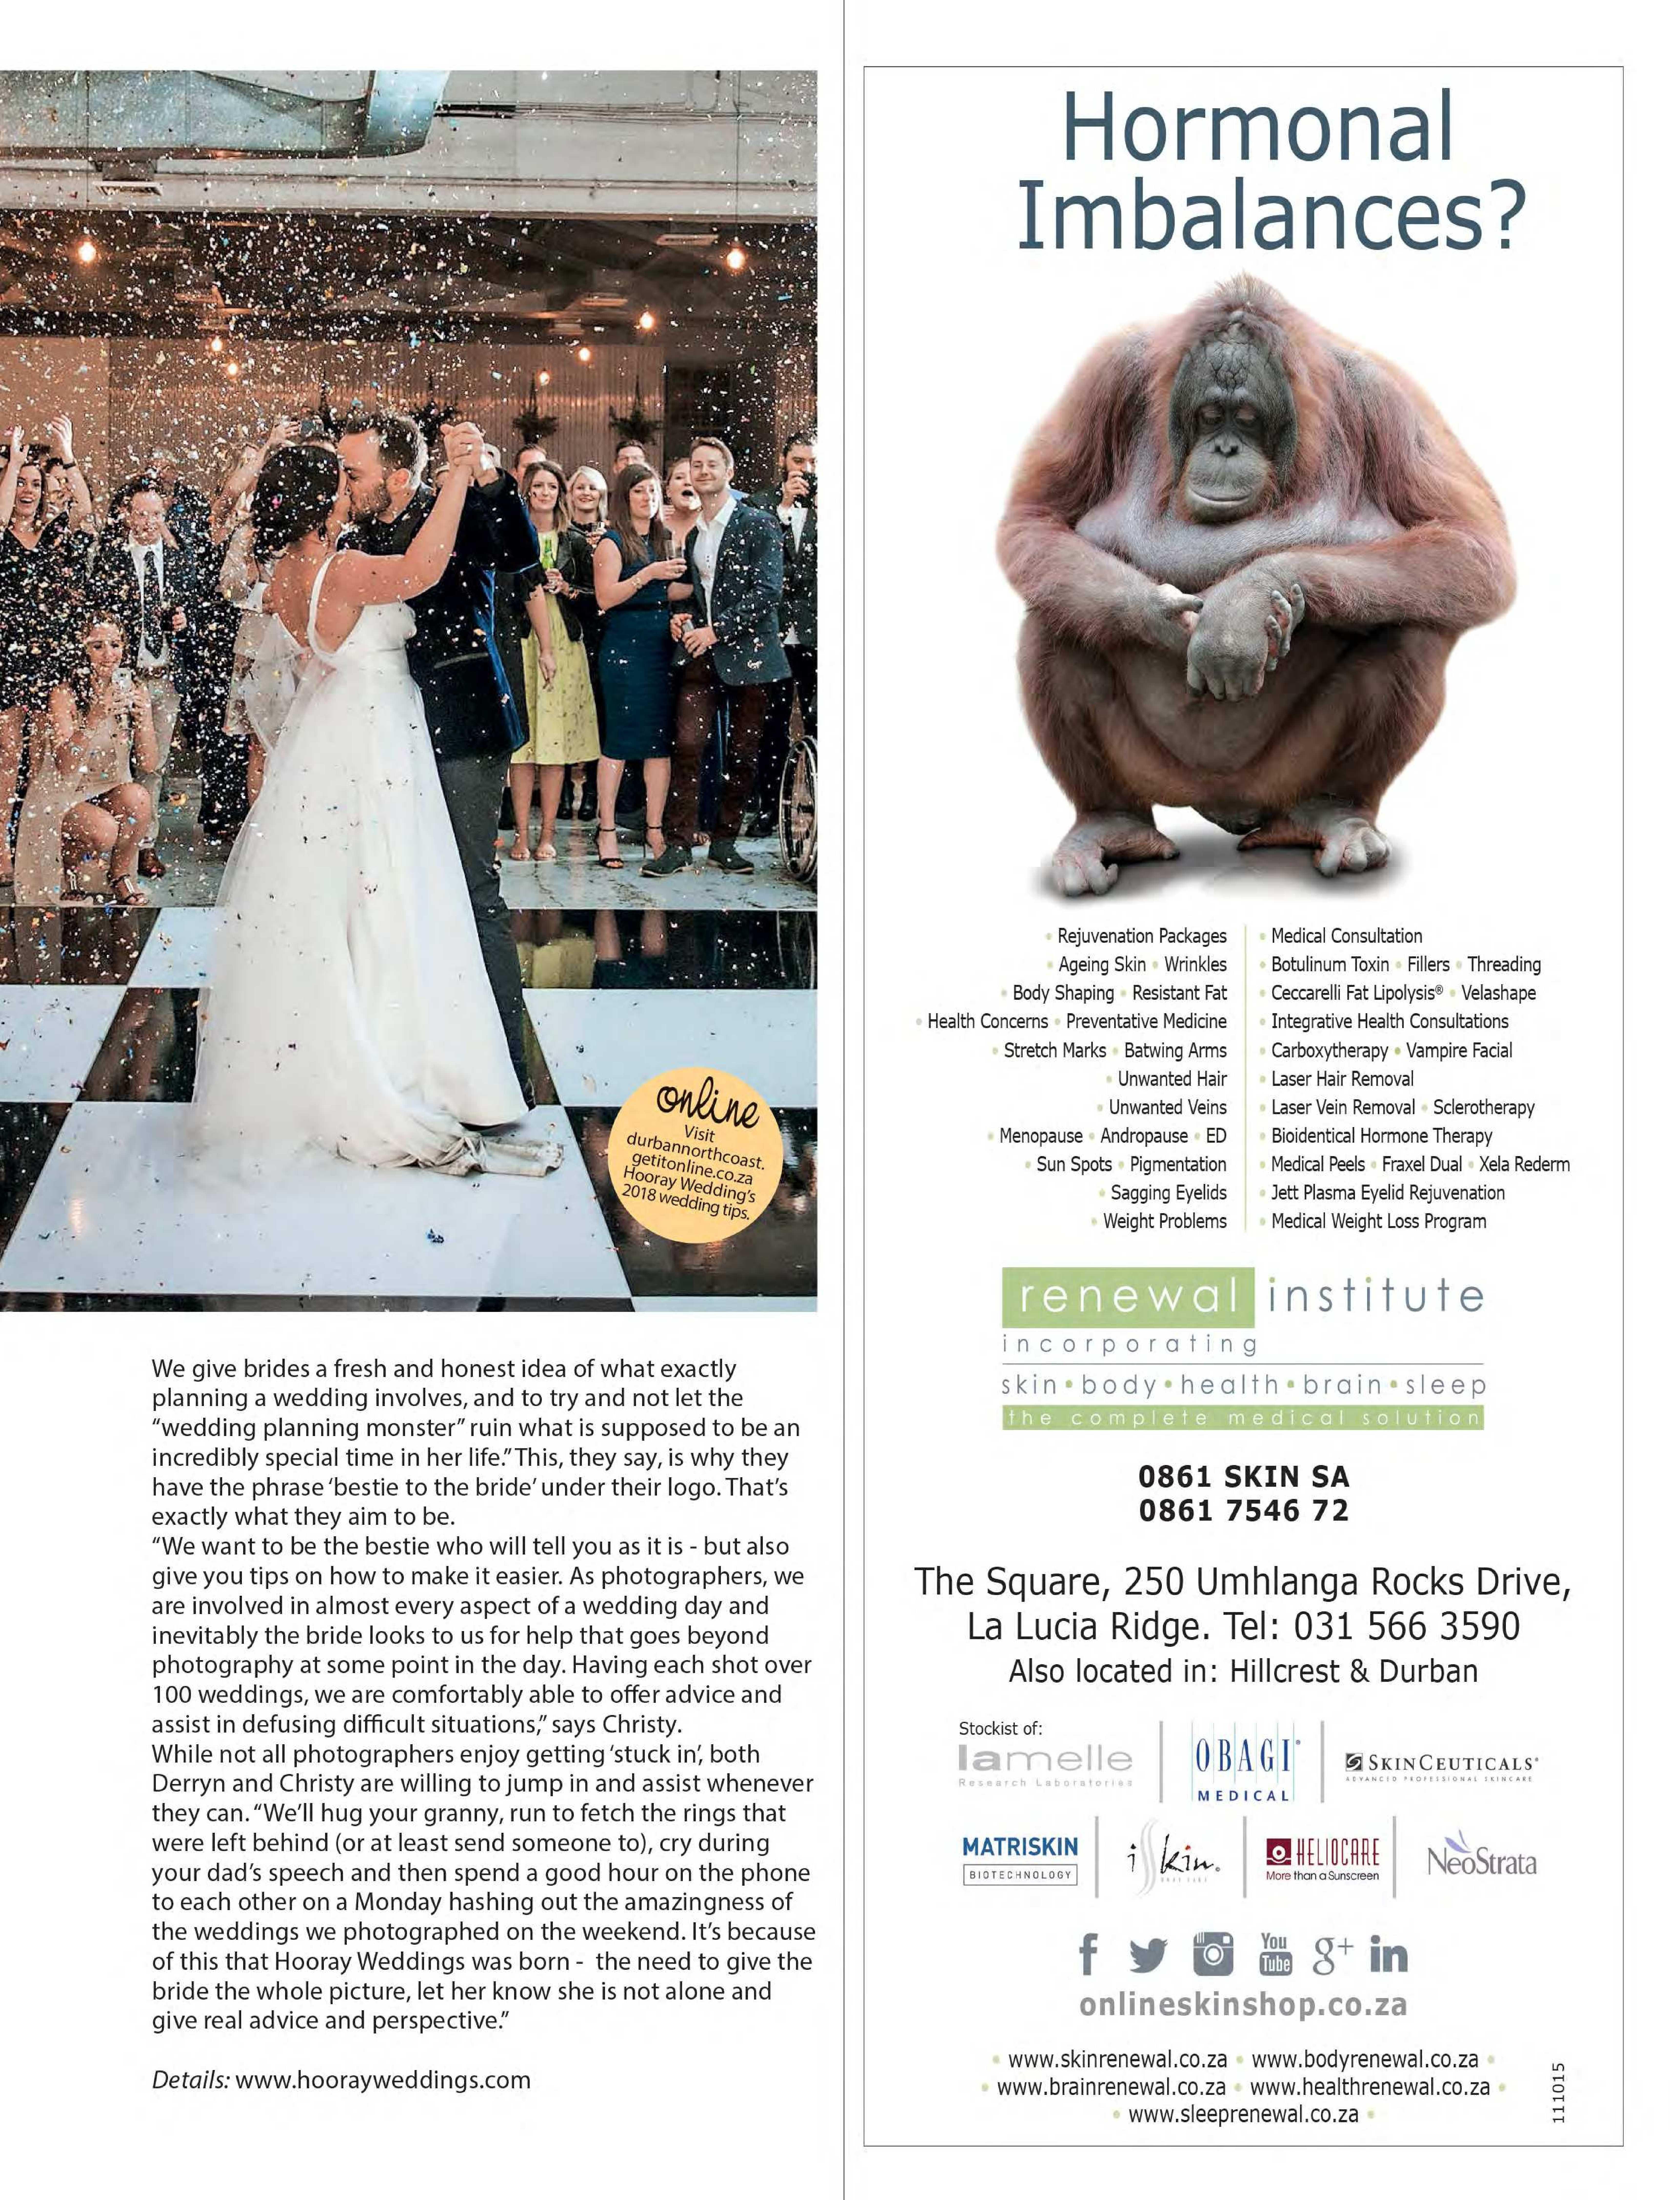 get-magazine-ballitoumhlanga-may-2018-epapers-page-33